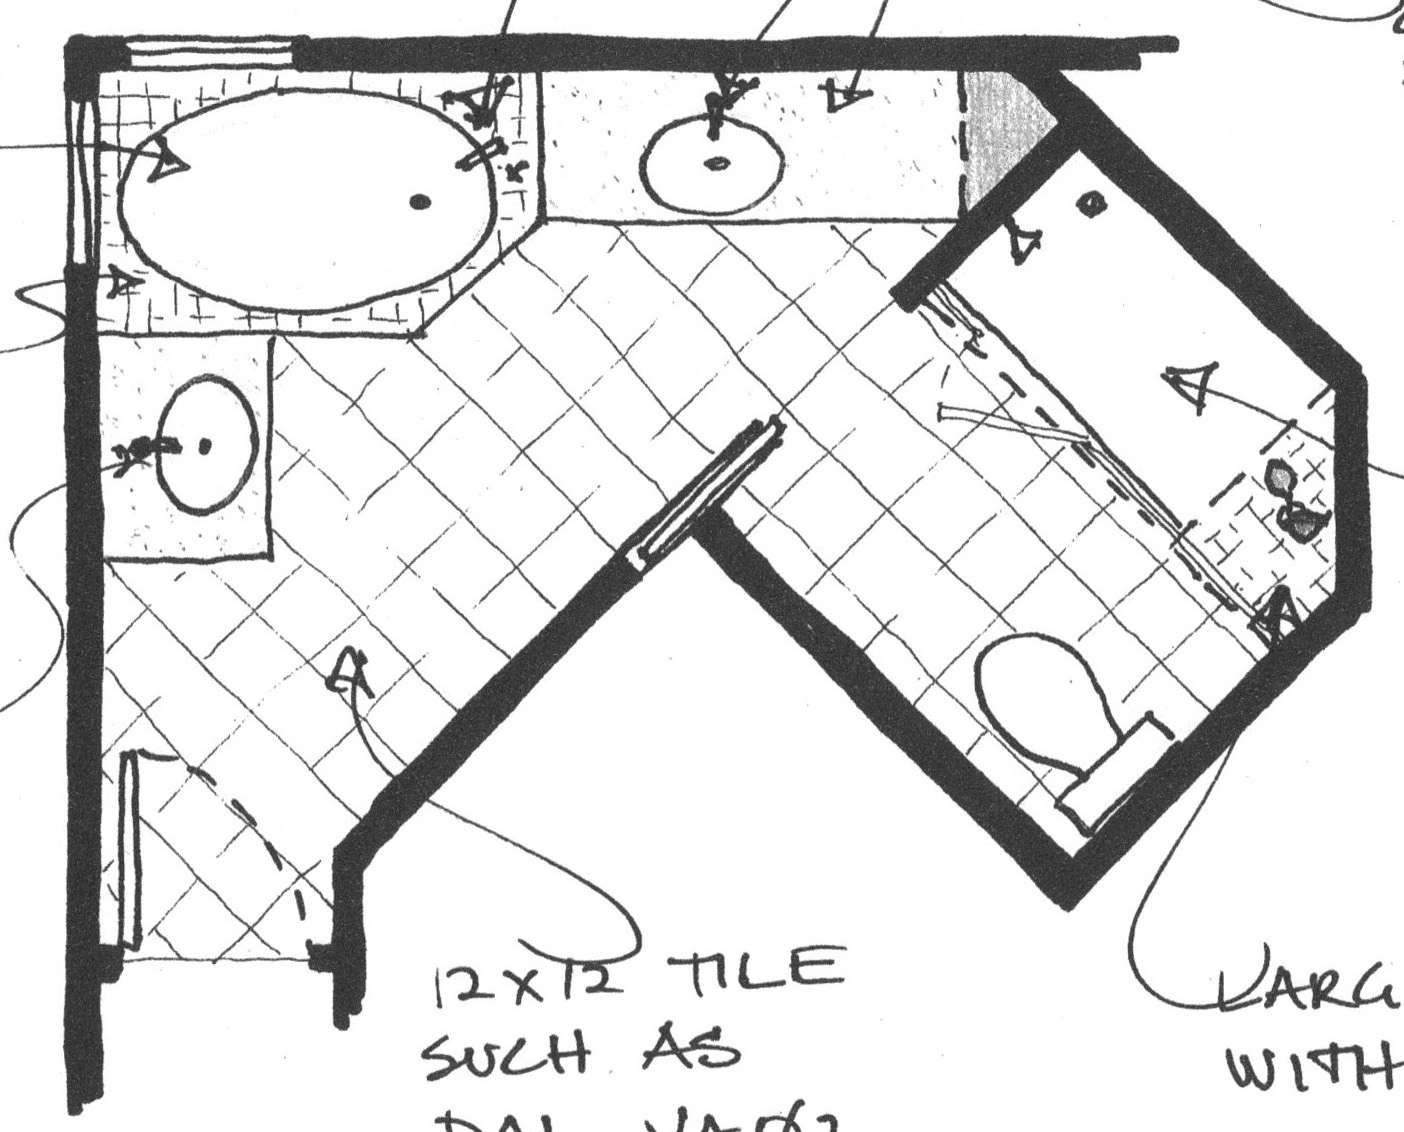 Triangle Bathroom Floor Plan Bathroom Floor Plans Room Layout How To Plan